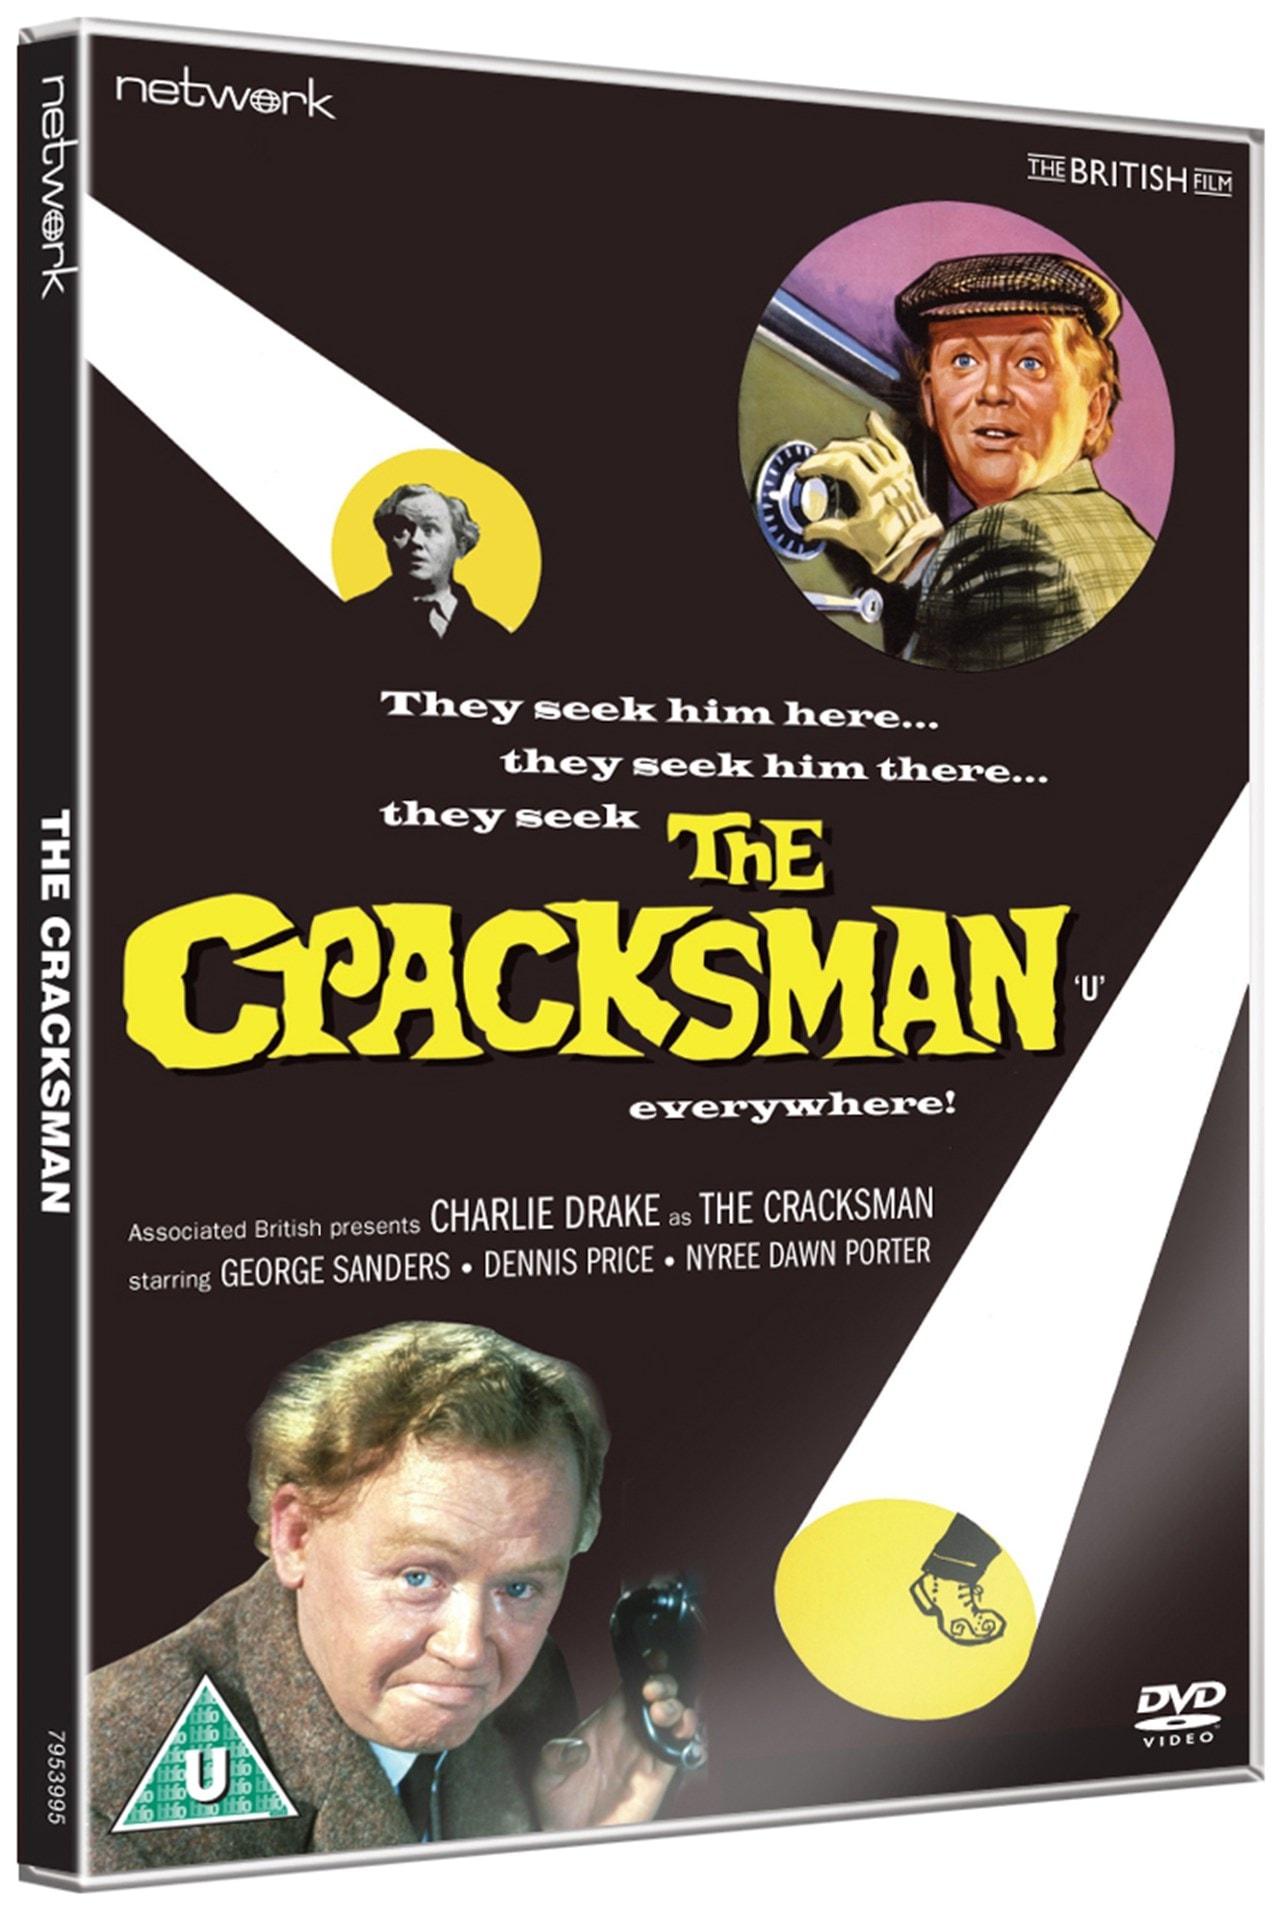 The Cracksman - 2